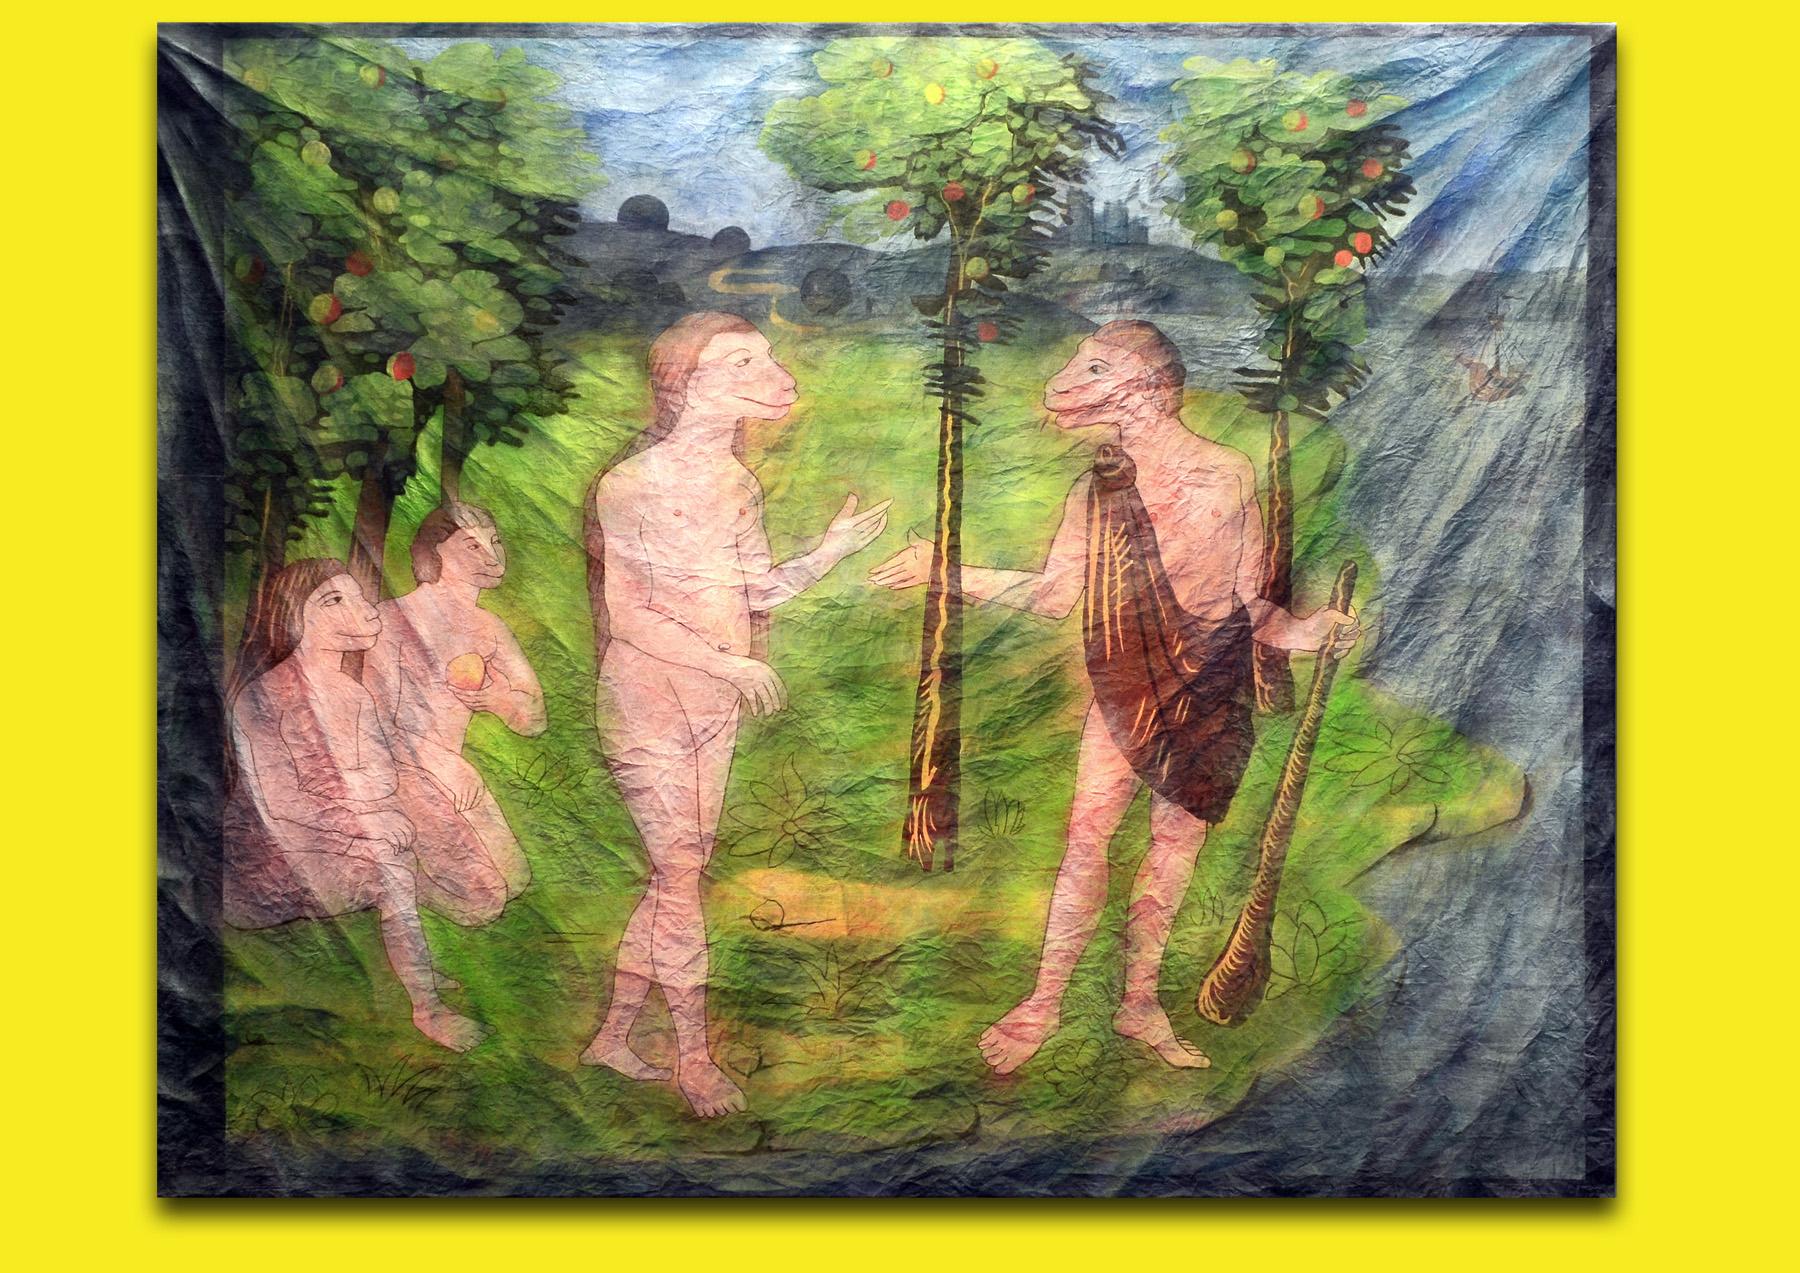 Michel Aniol Welt-Idiotikon Berlin Kunst Art Malerei Painting